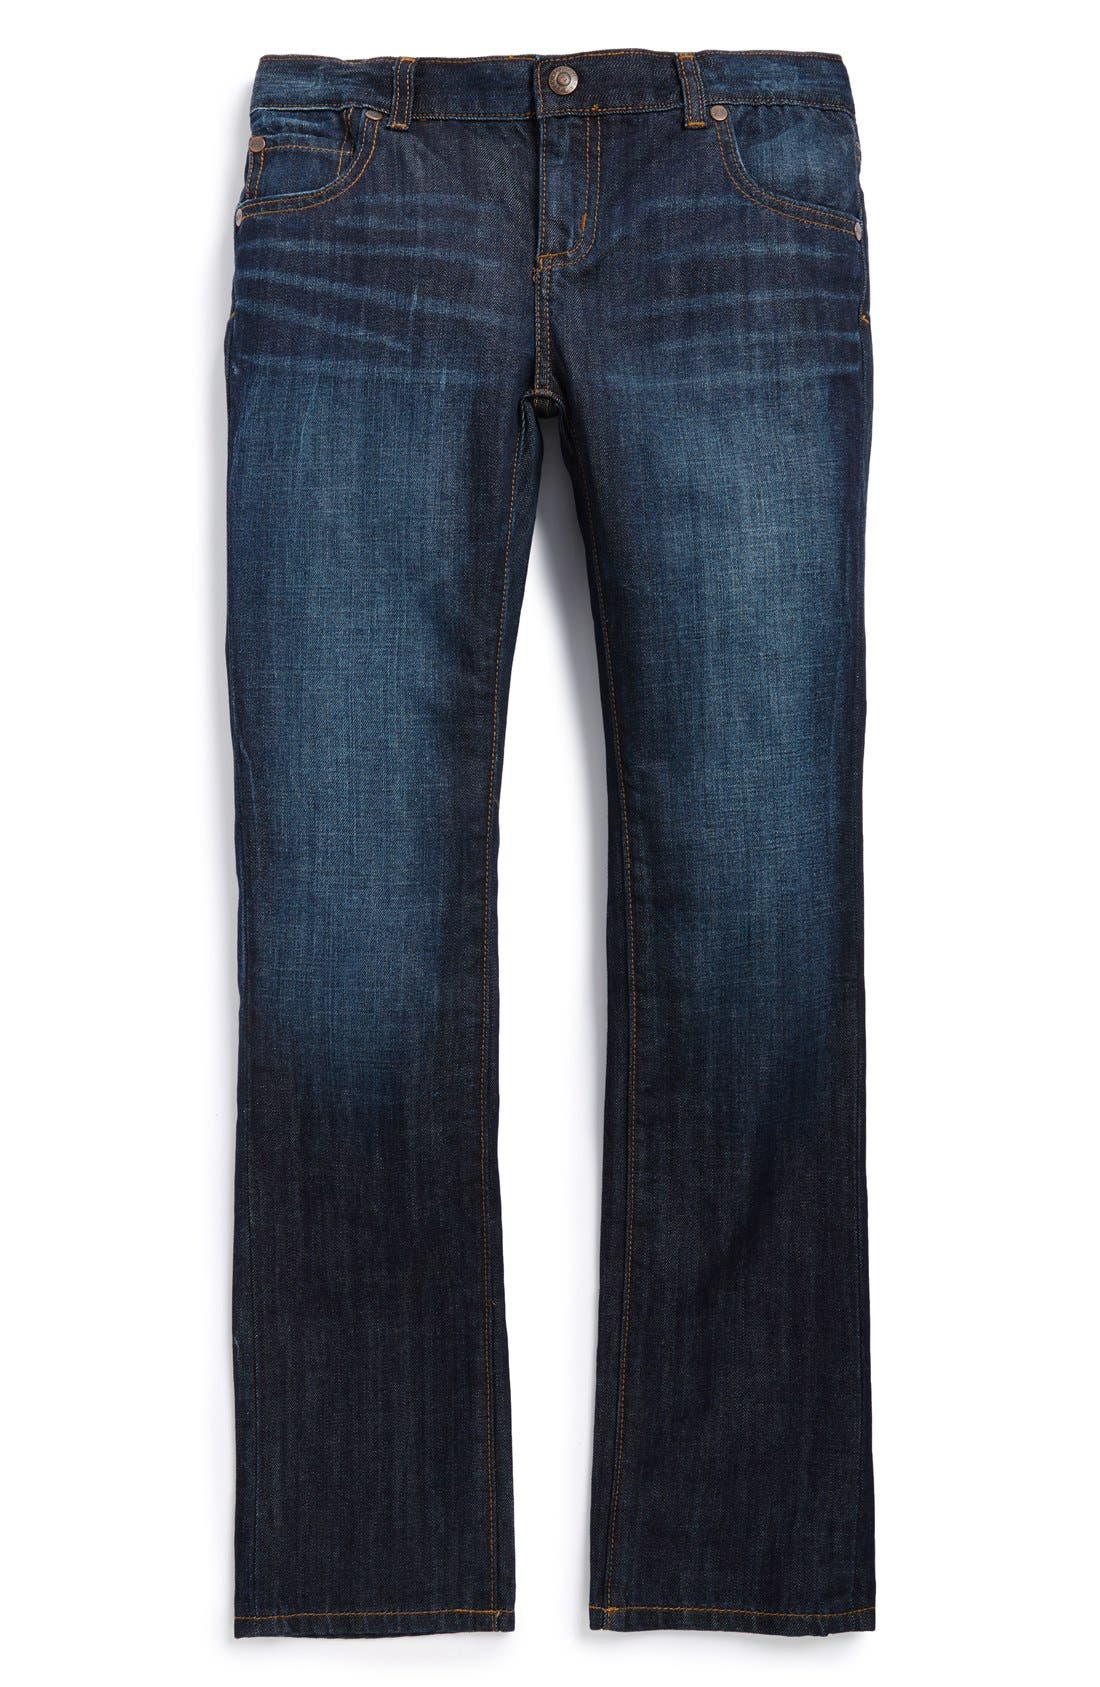 Peek Slouch Jeans (Toddler Boys, Little Boys & Big Boys)